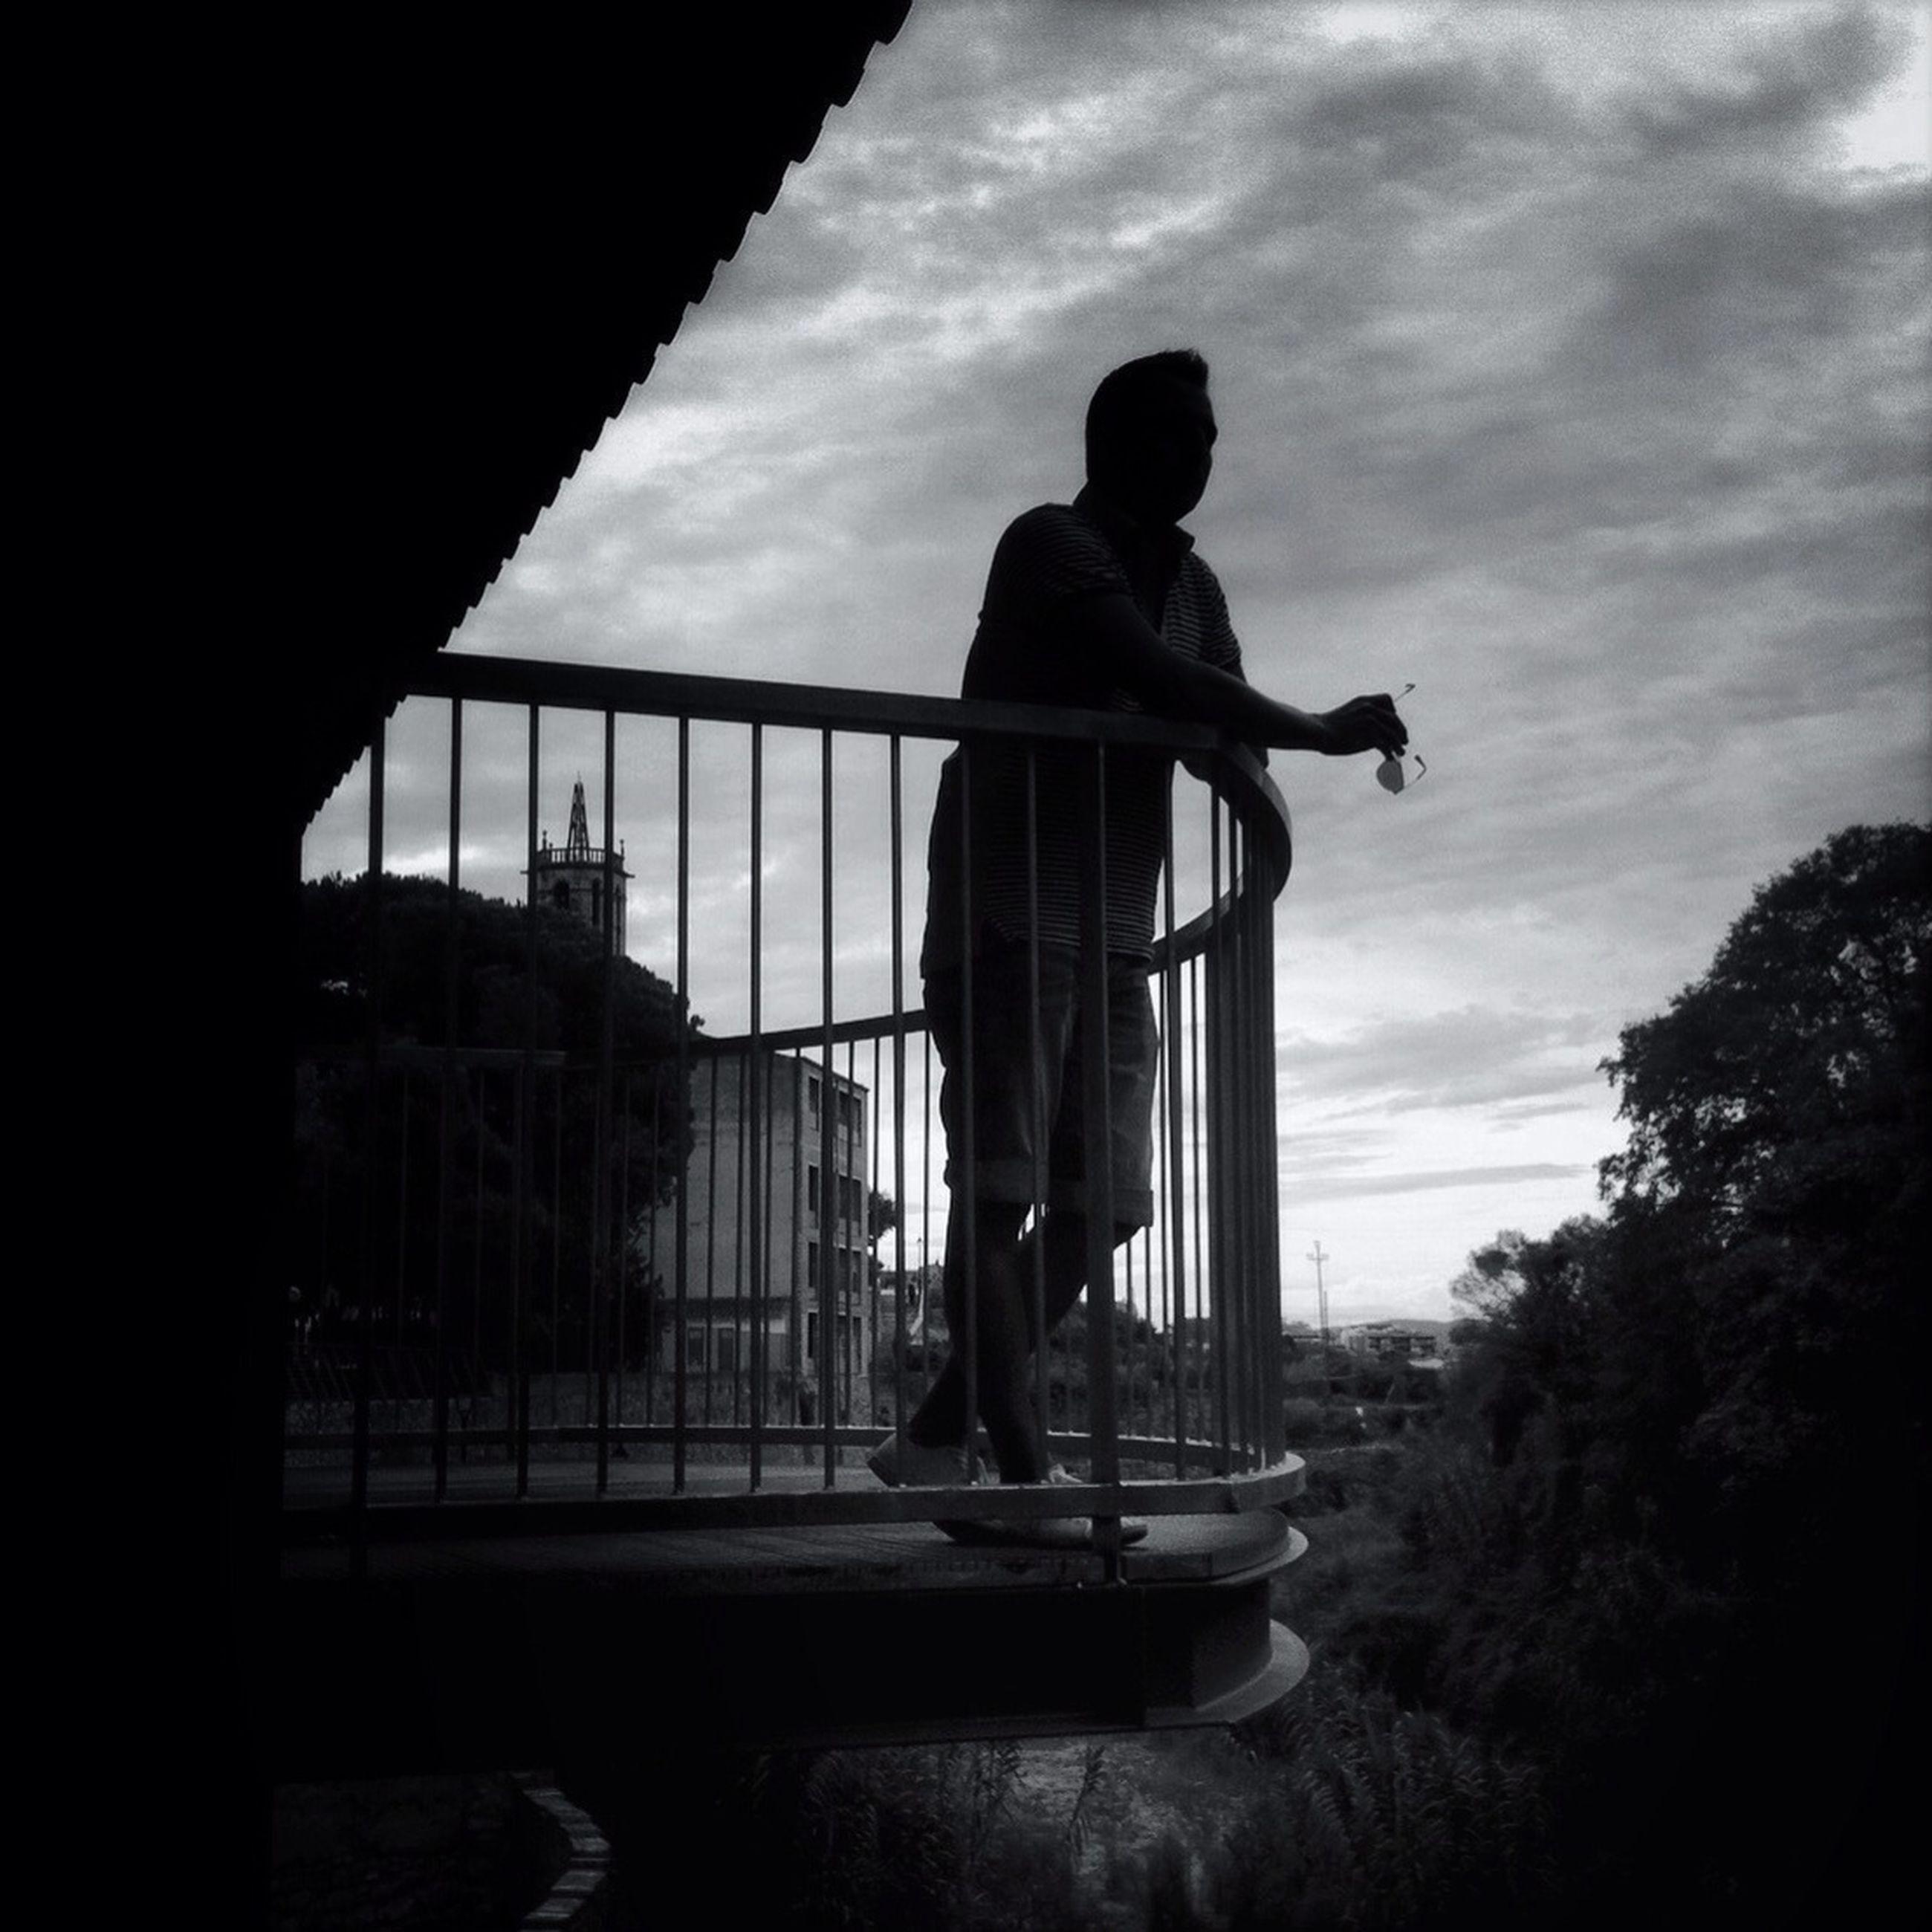 silhouette, sky, full length, lifestyles, men, leisure activity, standing, rear view, built structure, cloud - sky, architecture, side view, person, transportation, cloud, railing, sunset